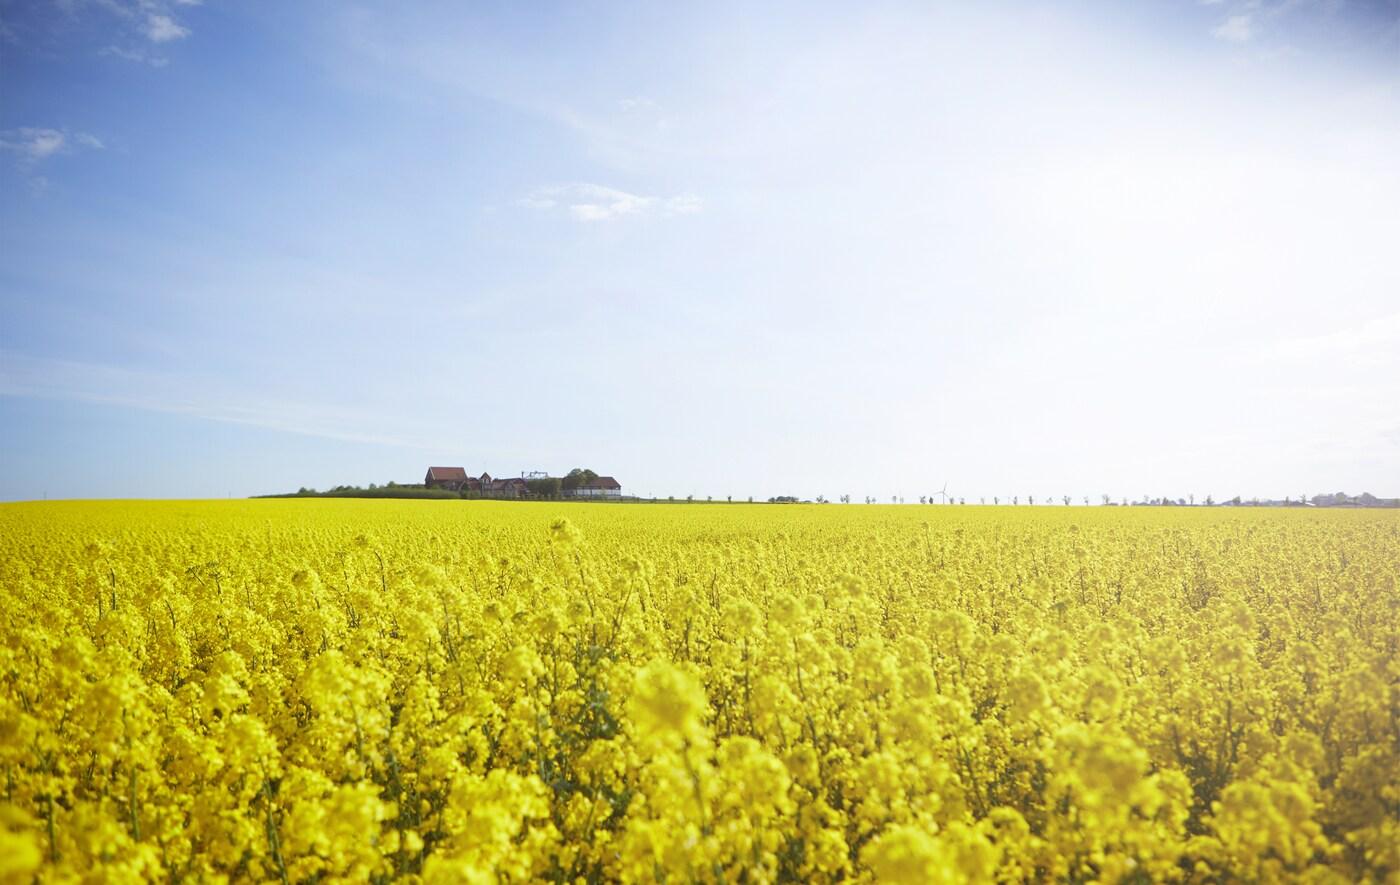 Champ de colza jaune.